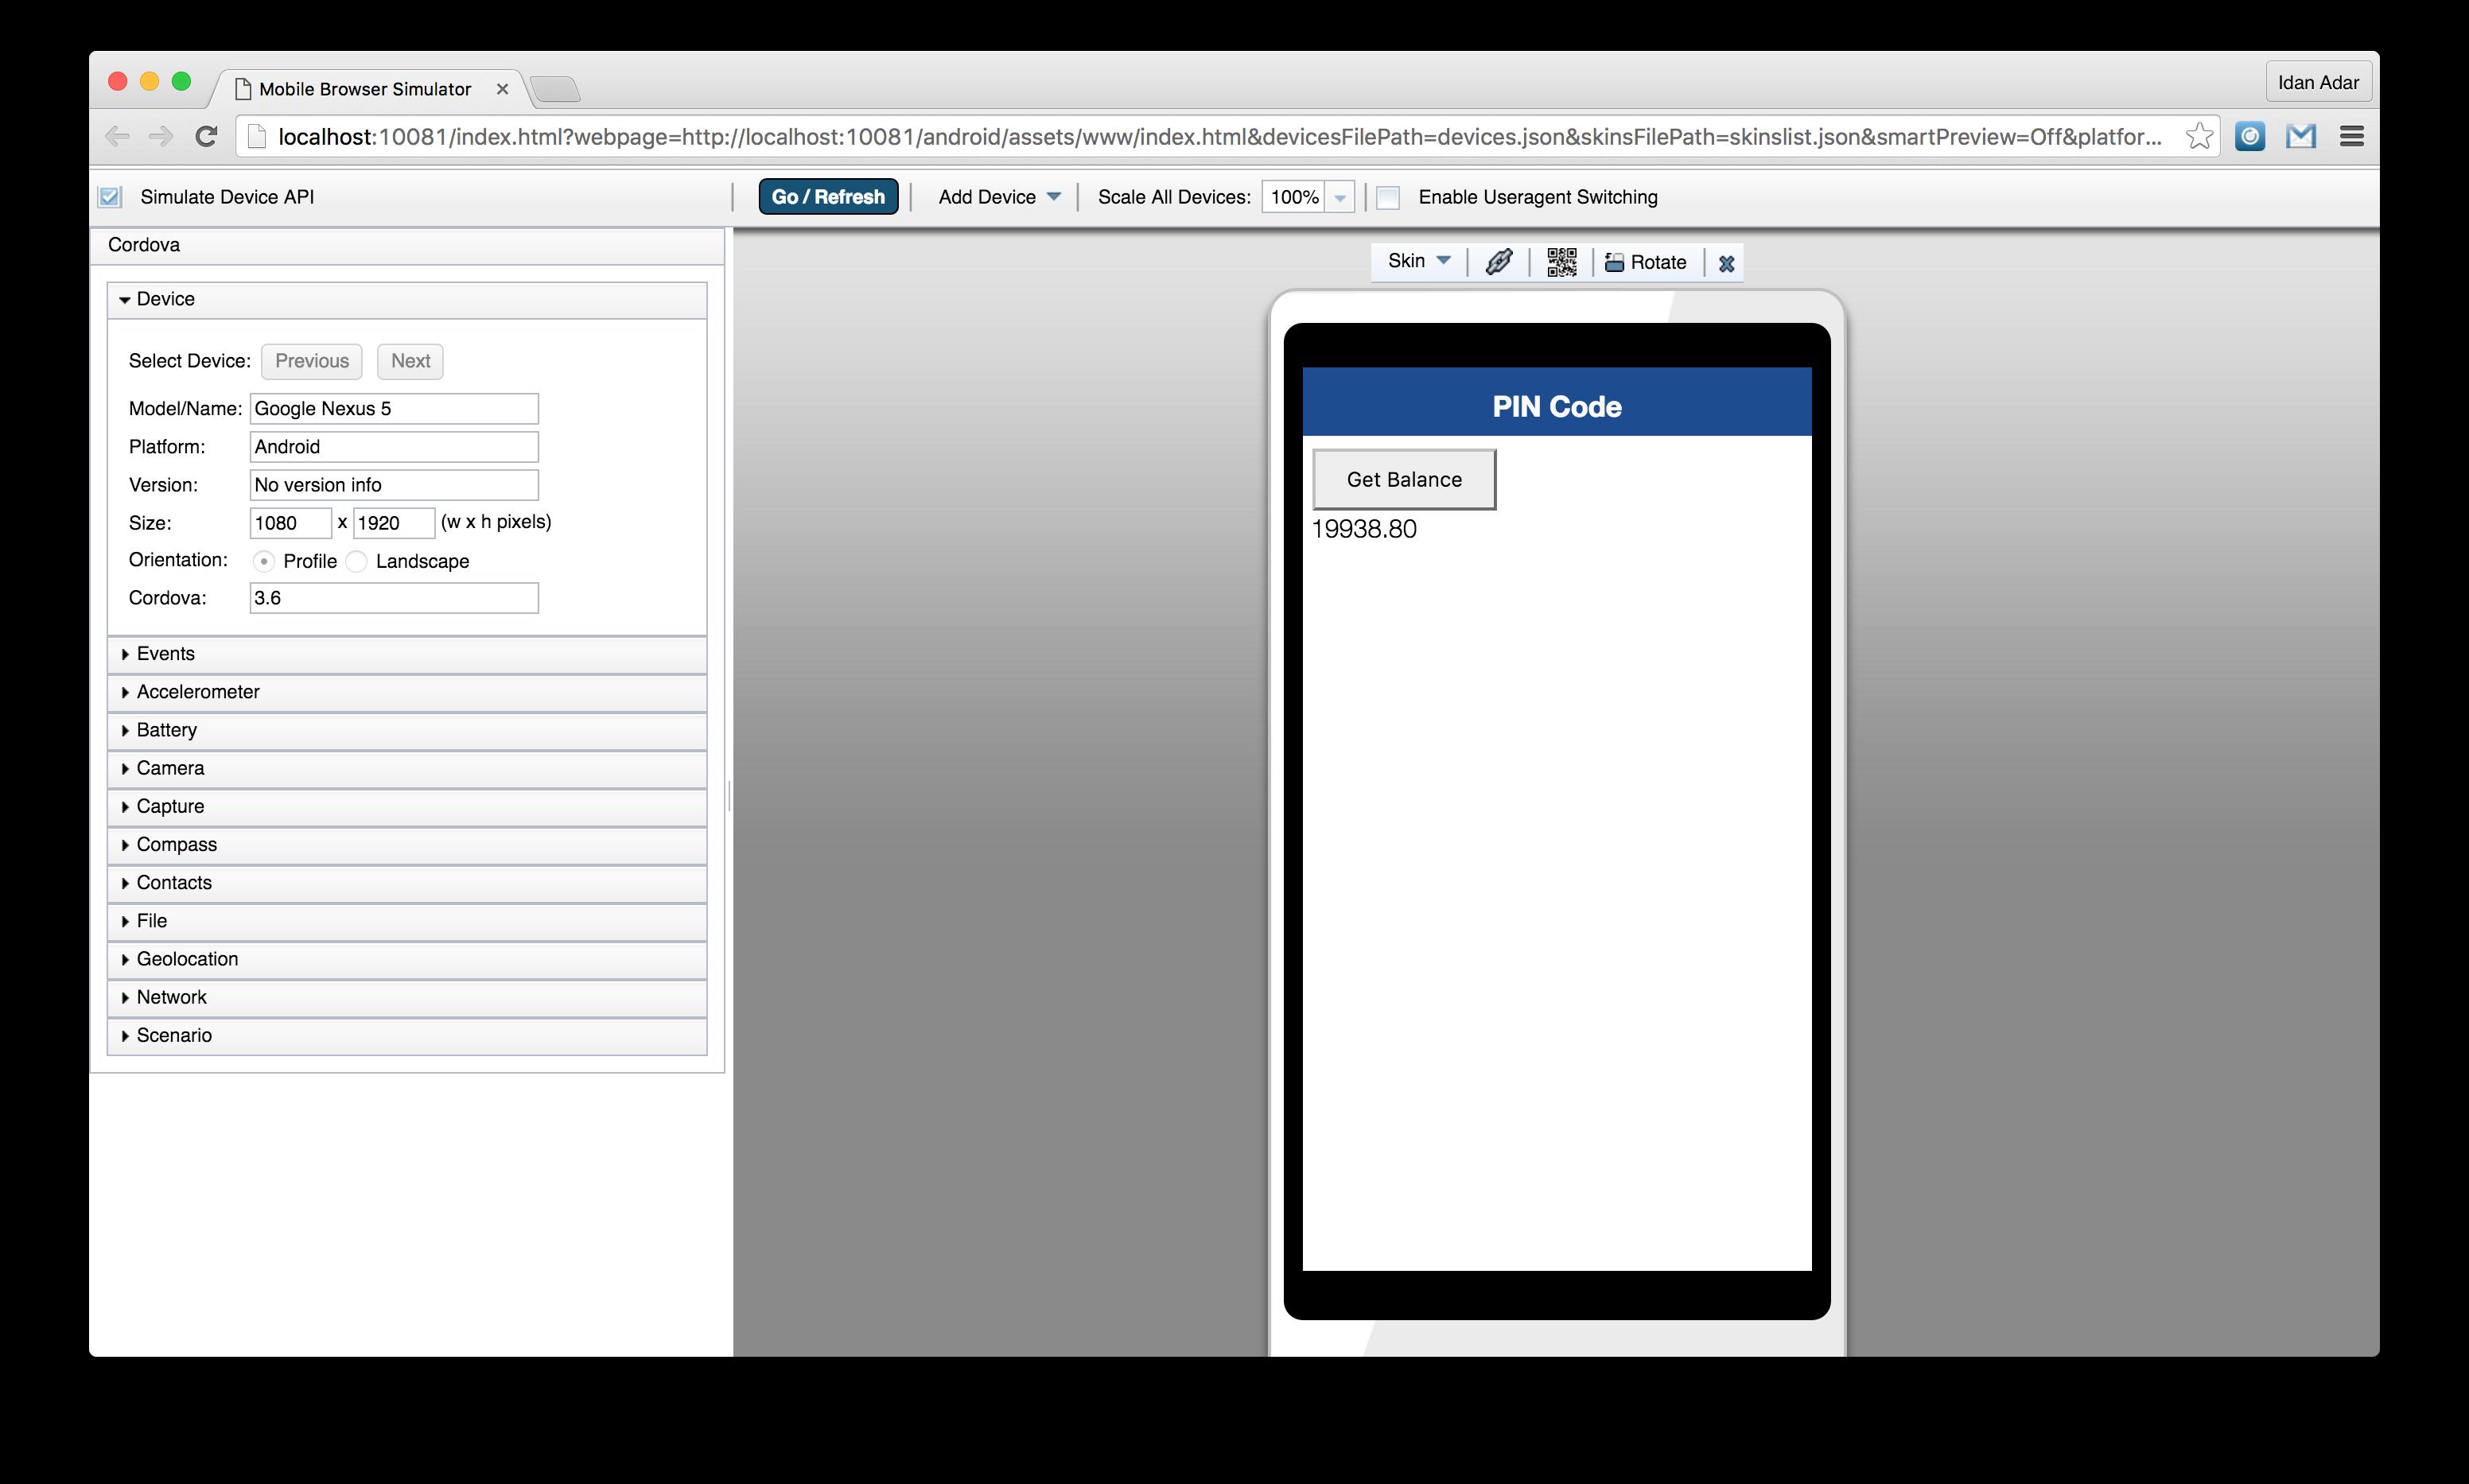 Debugging JavaScript (Cordova, Web) Applications - IBM